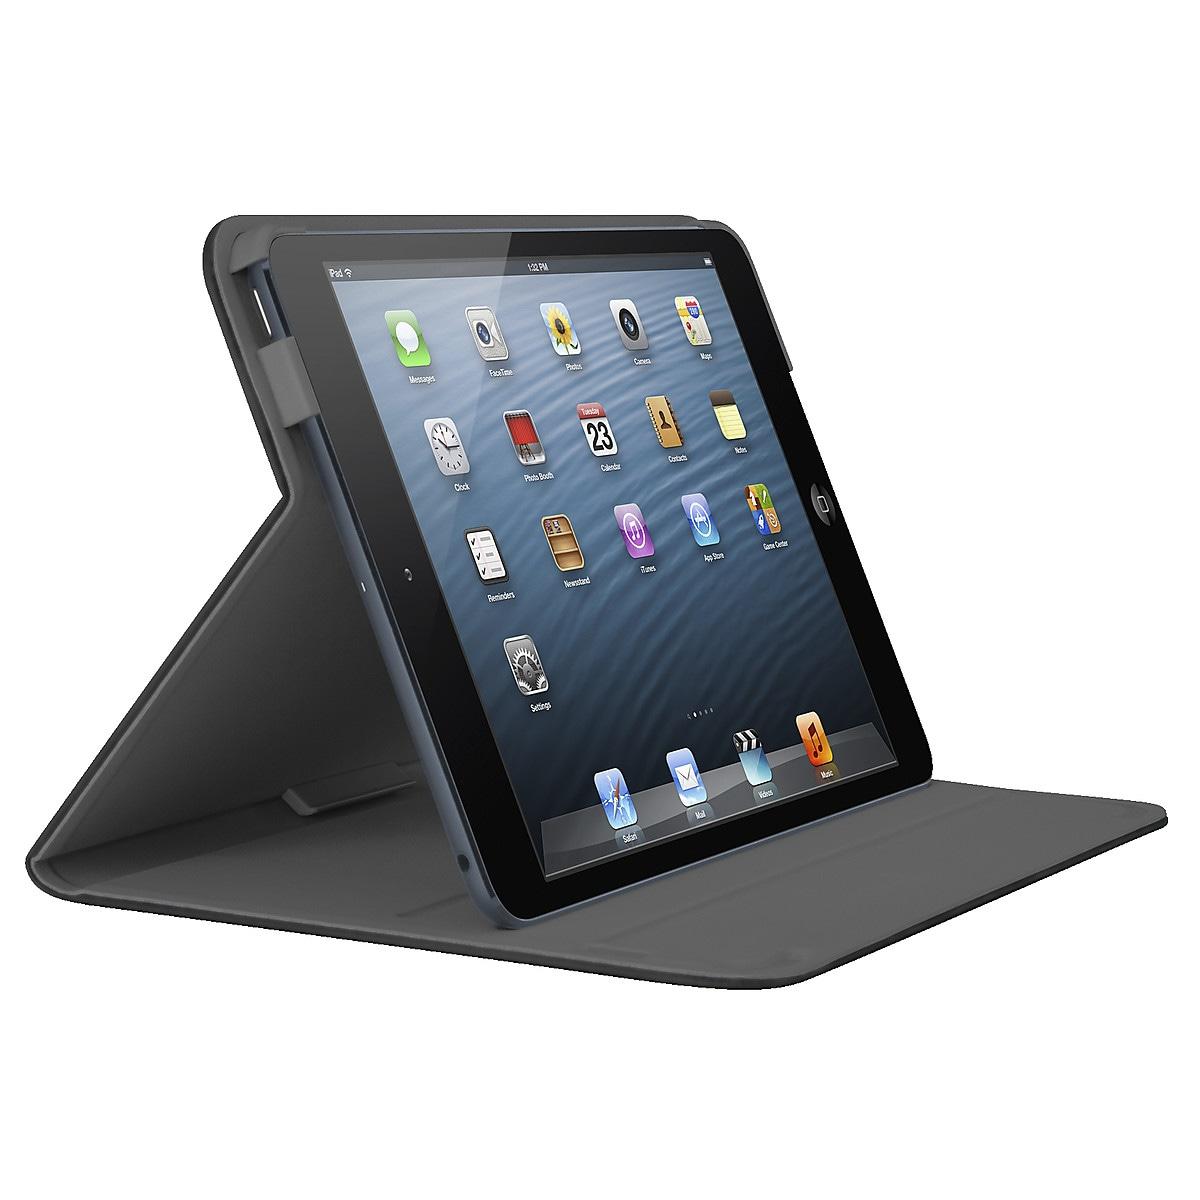 Fodral för iPad mini, Belkin FormFit Coverlet